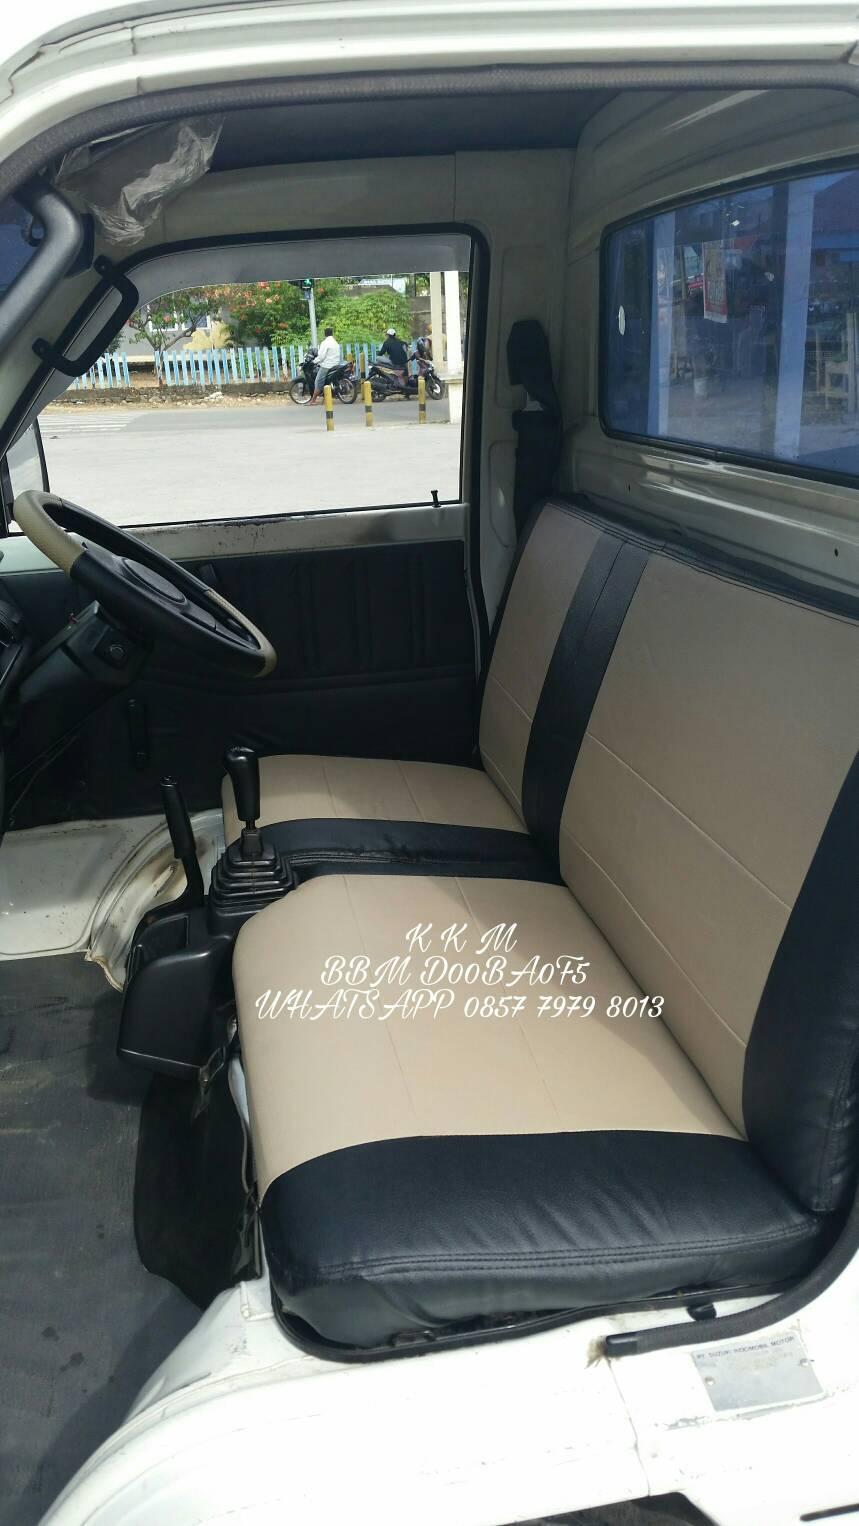 kkm sarung jok mobil suzuki carry pickup futura real van oscar 1494407021 89f098d3